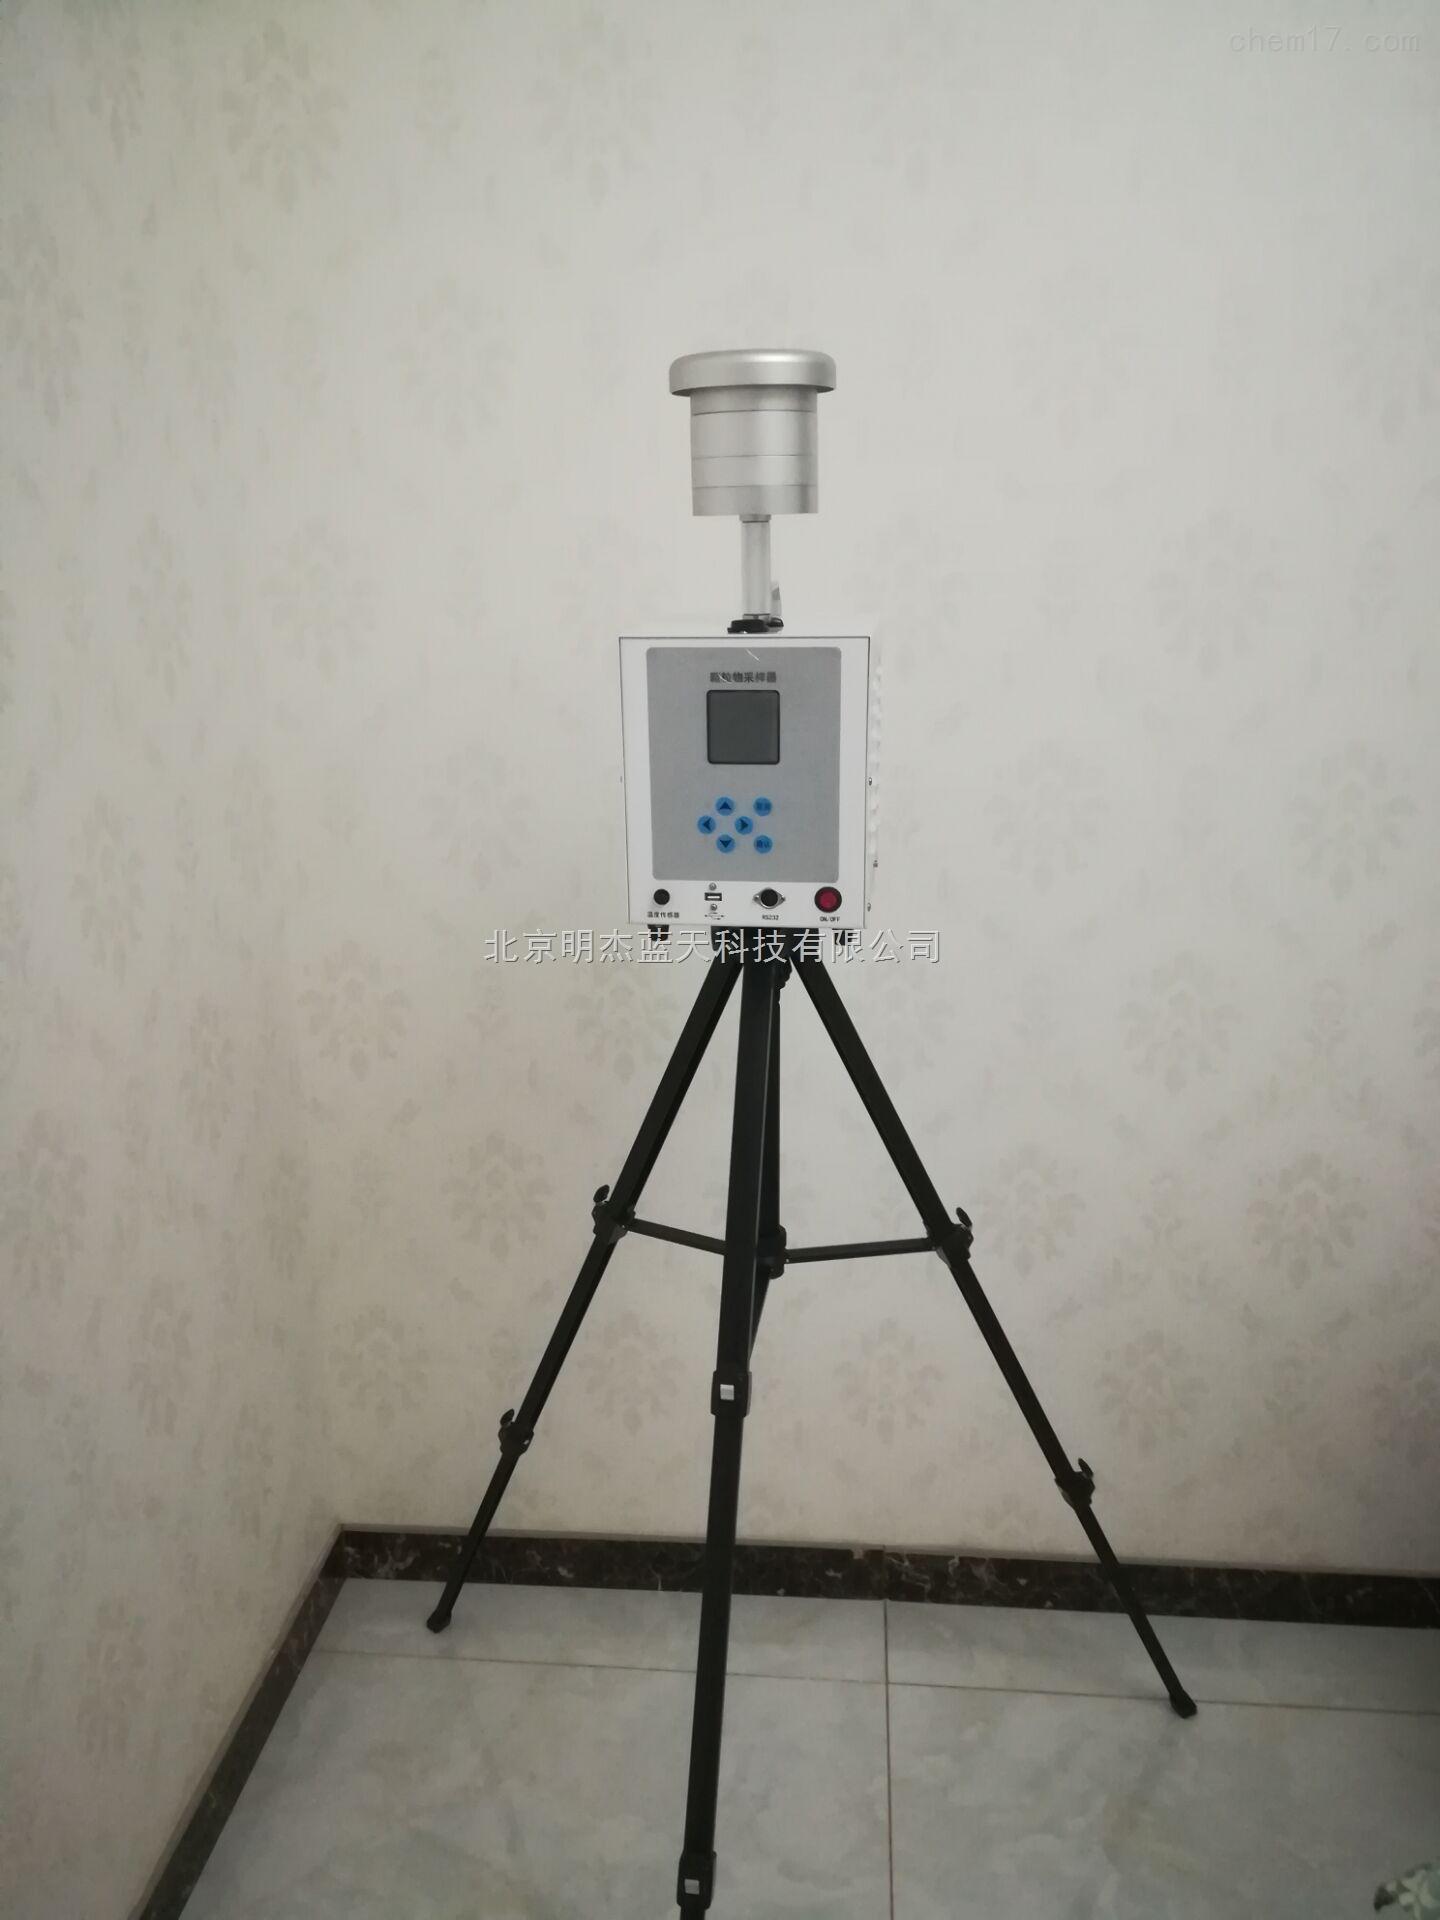 MJ-2200A型智能TSP采样器